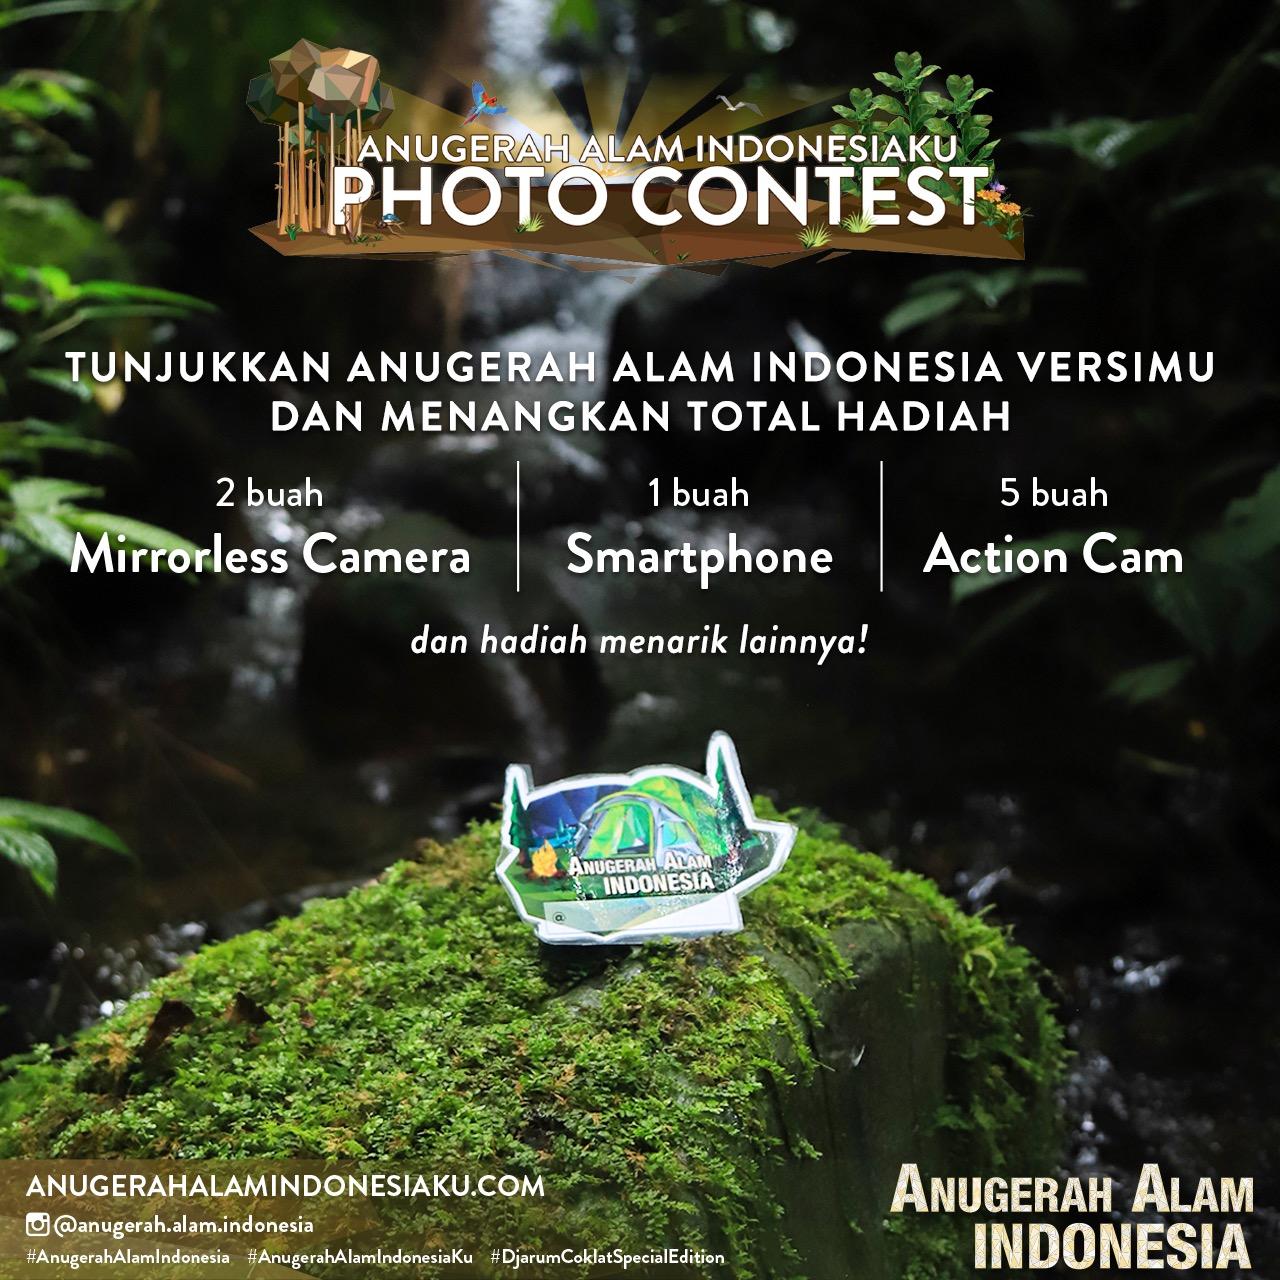 Anugerah Alam Indonesia Photo Contest